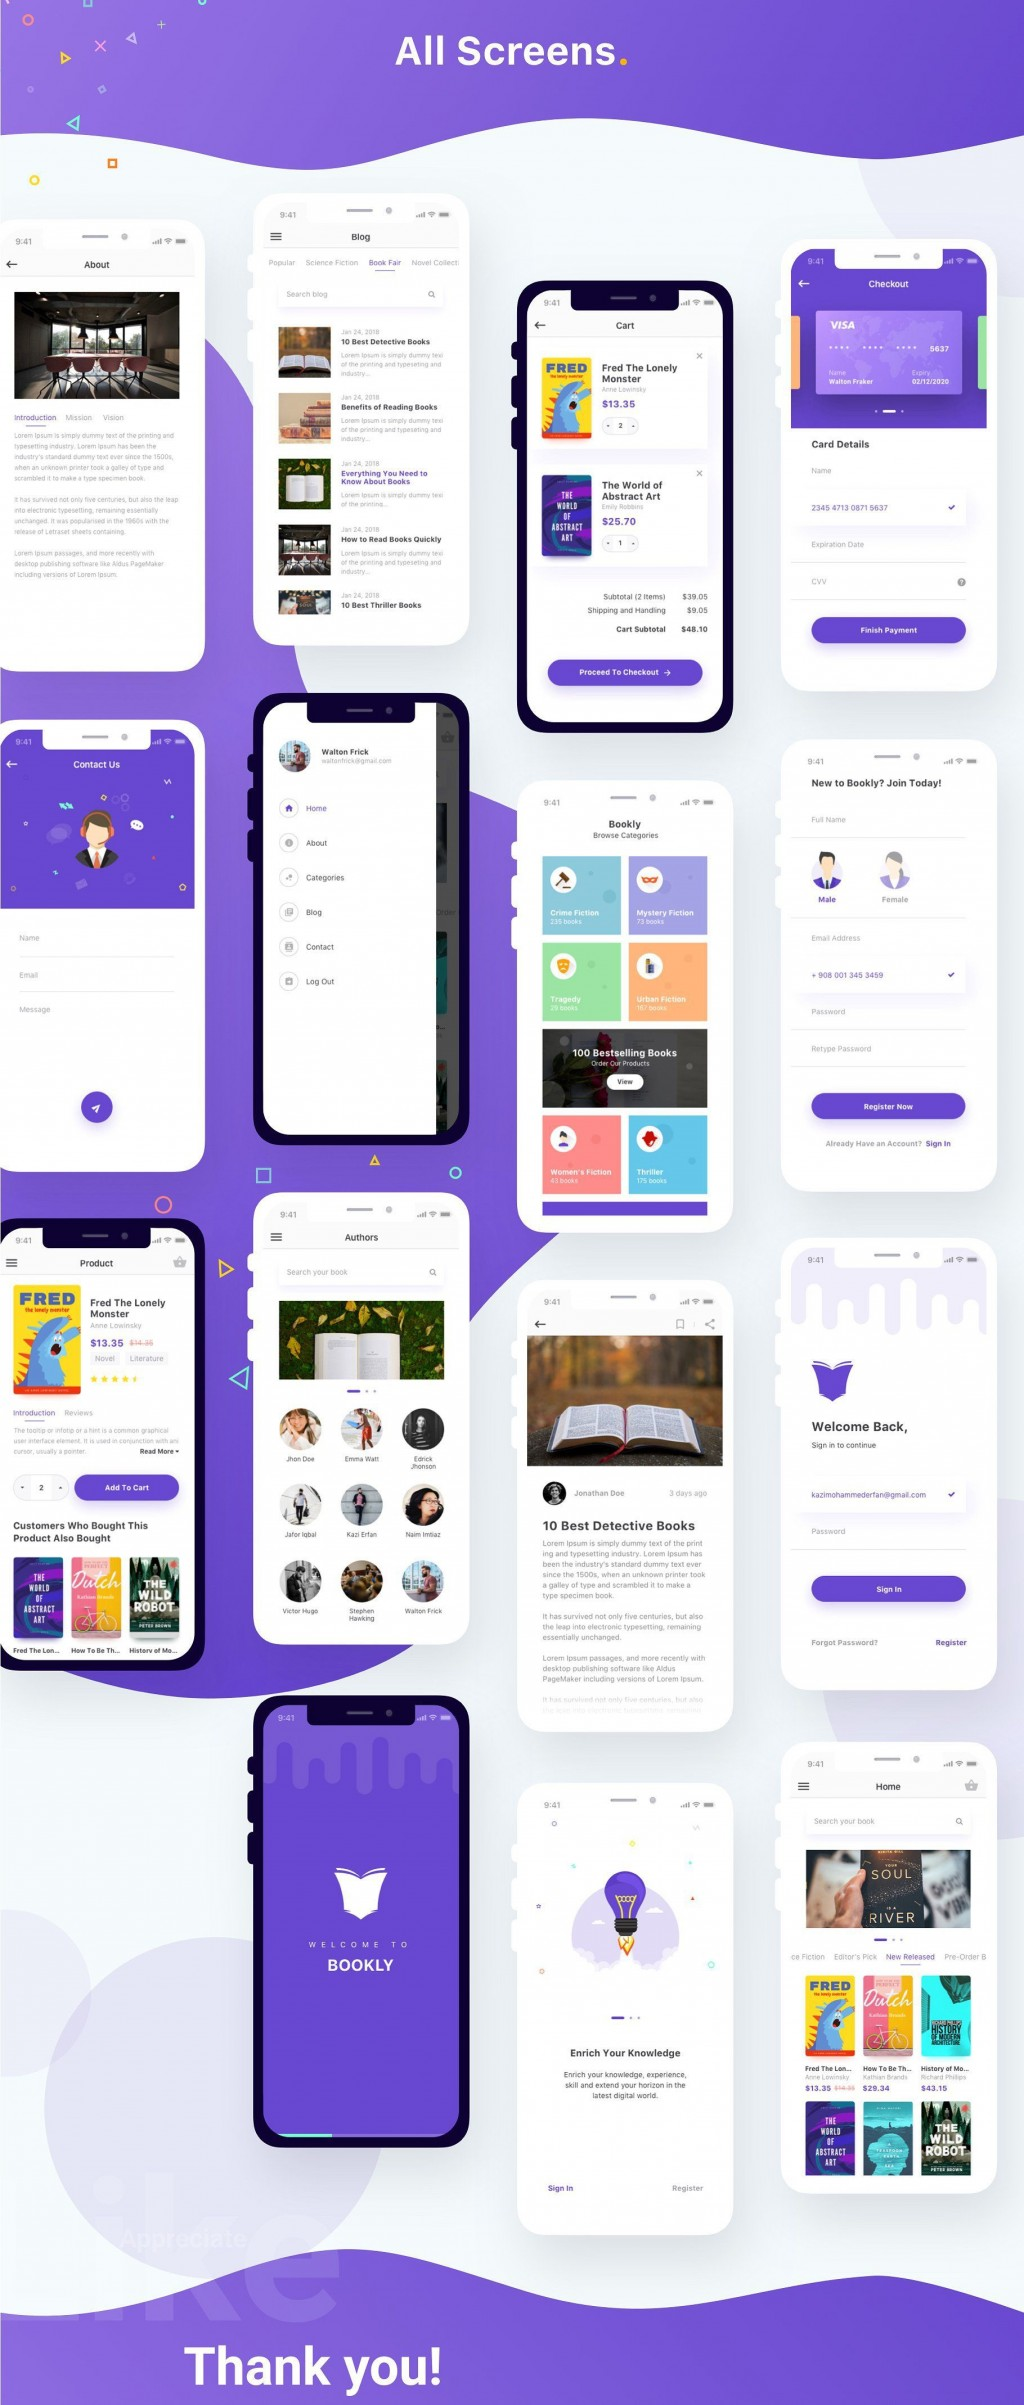 001 Fantastic Iphone App Design Template High Def  X Io SketchLarge